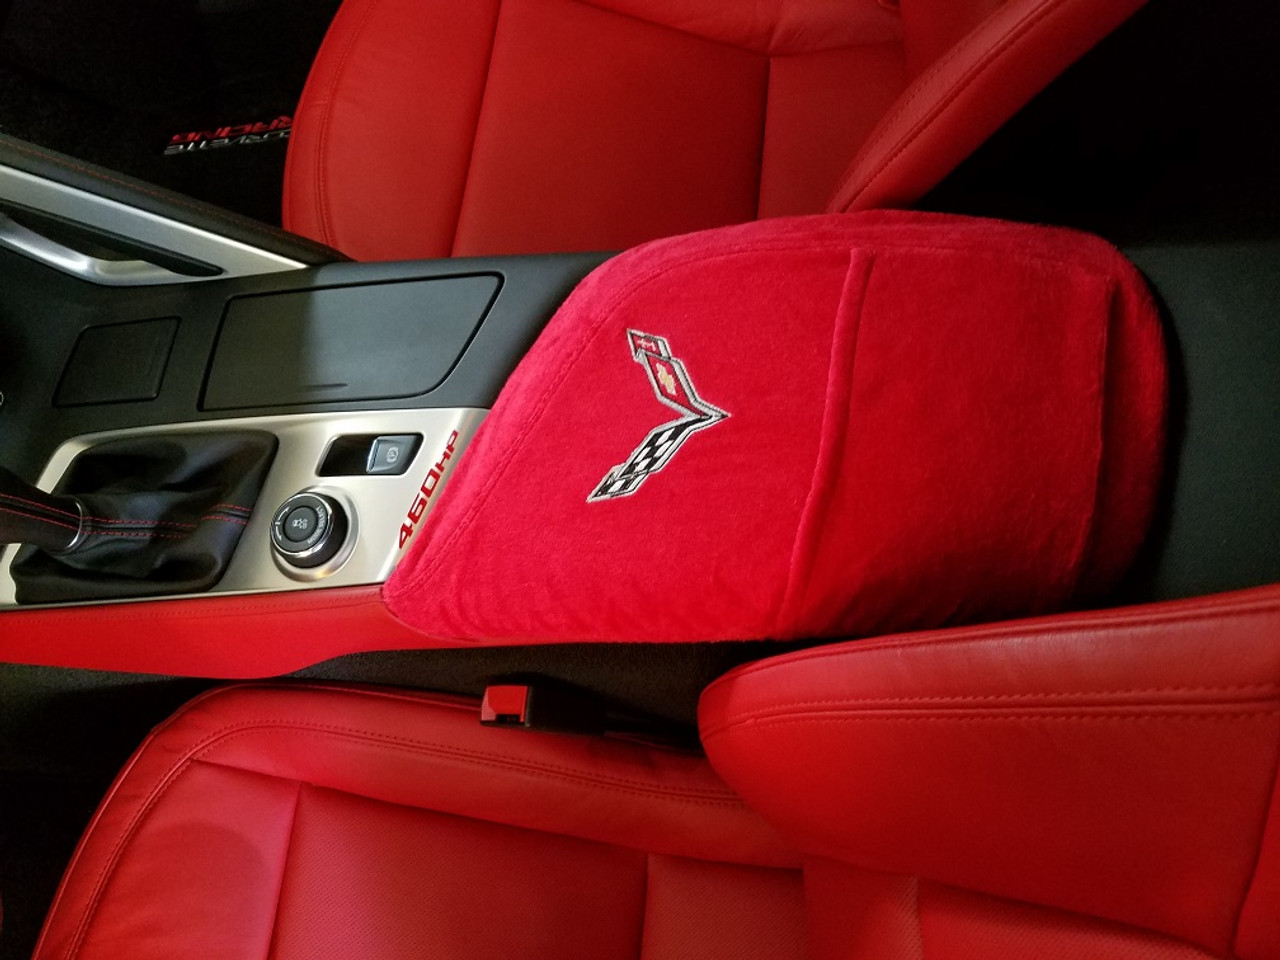 NEW fit 97-04 Chevrolet Corvette Driver Side Left LH Mirror Glass NON-HEAT #2835